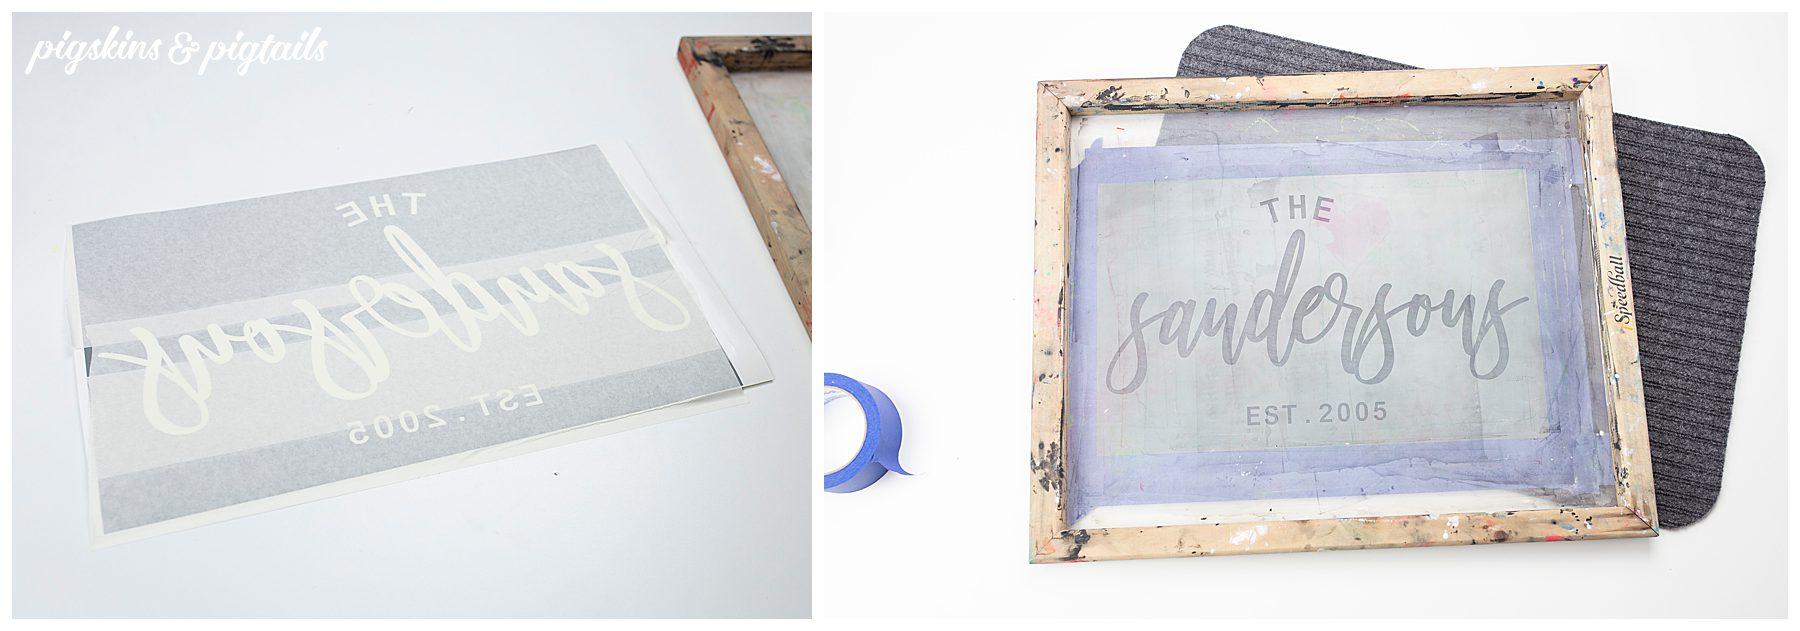 personalized doormat vinyl painting screen printing